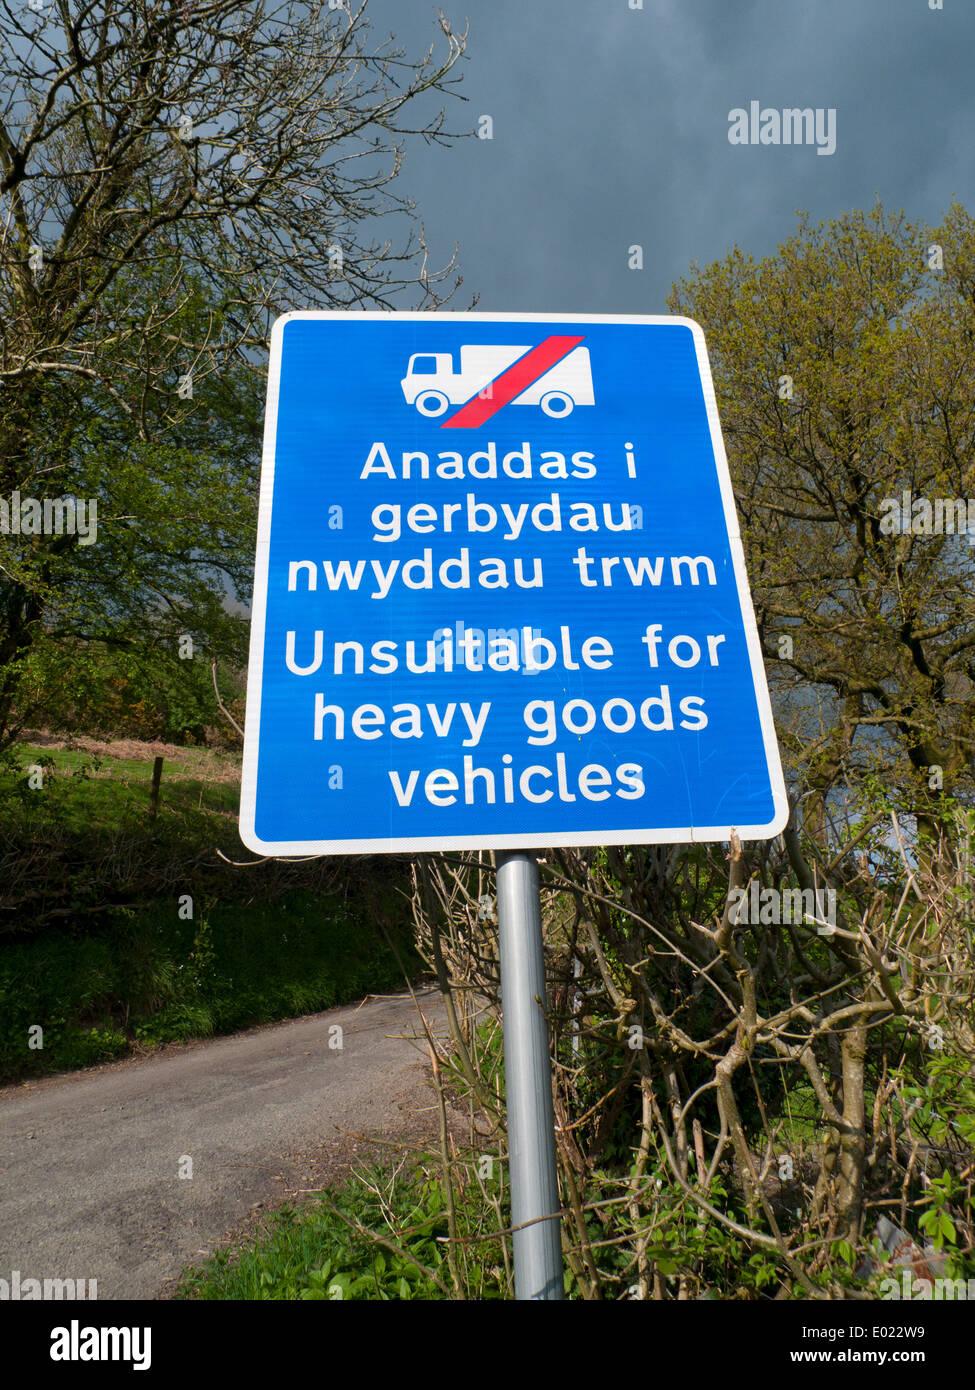 Bilingual Welsh English language sign forbidding HGV vehicles to use a narrow country lane Carmarthenshire Wales UK KATHY DEWITT - Stock Image